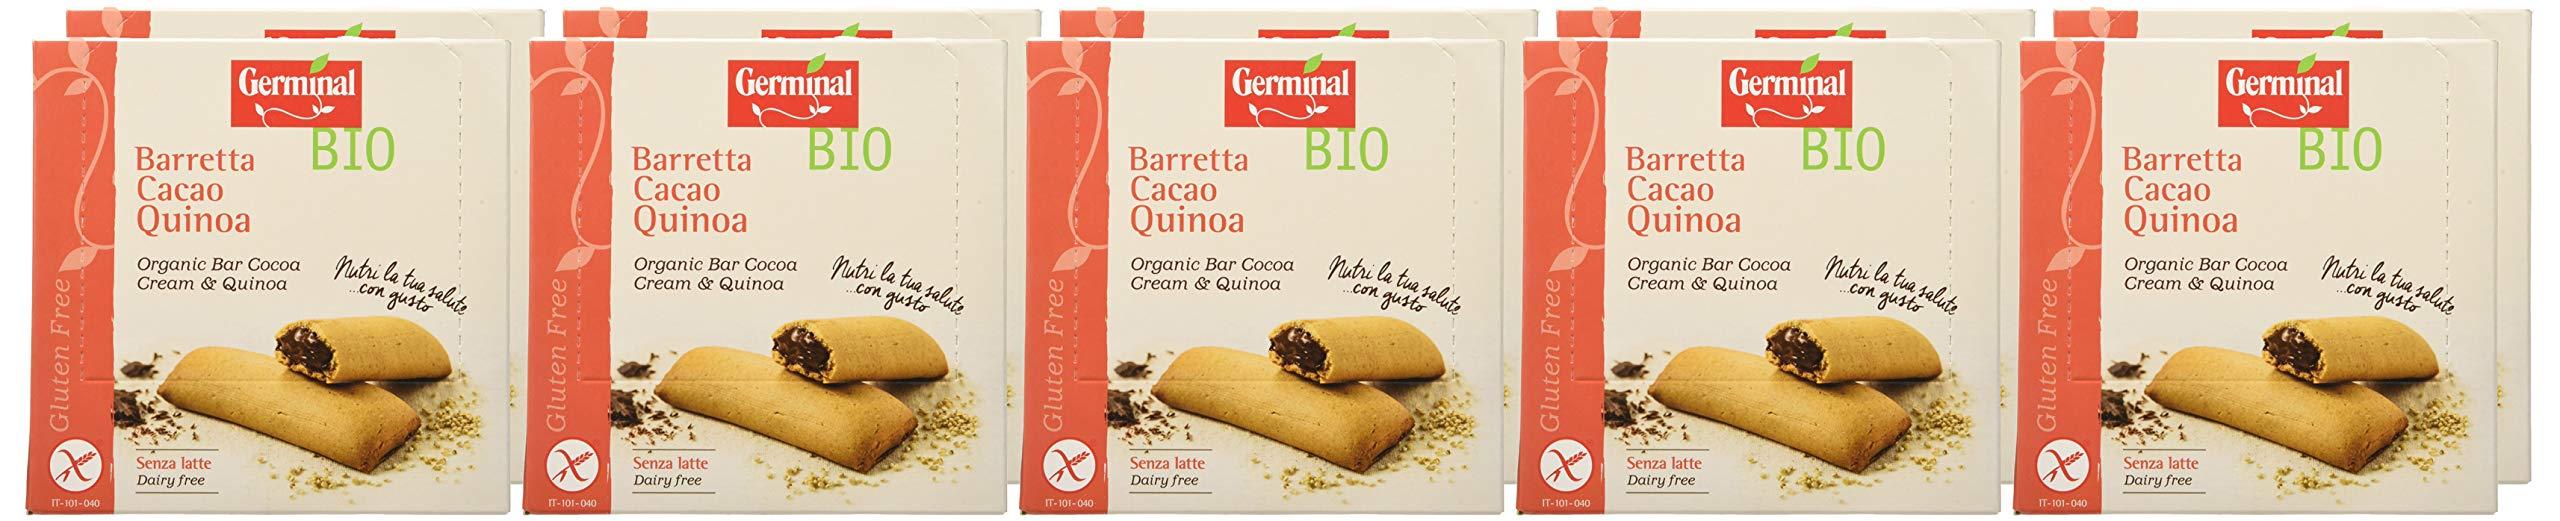 Germinal Bio Barretta Cacao Quinoa - 1800 gr, Senza glutine 2 spesavip